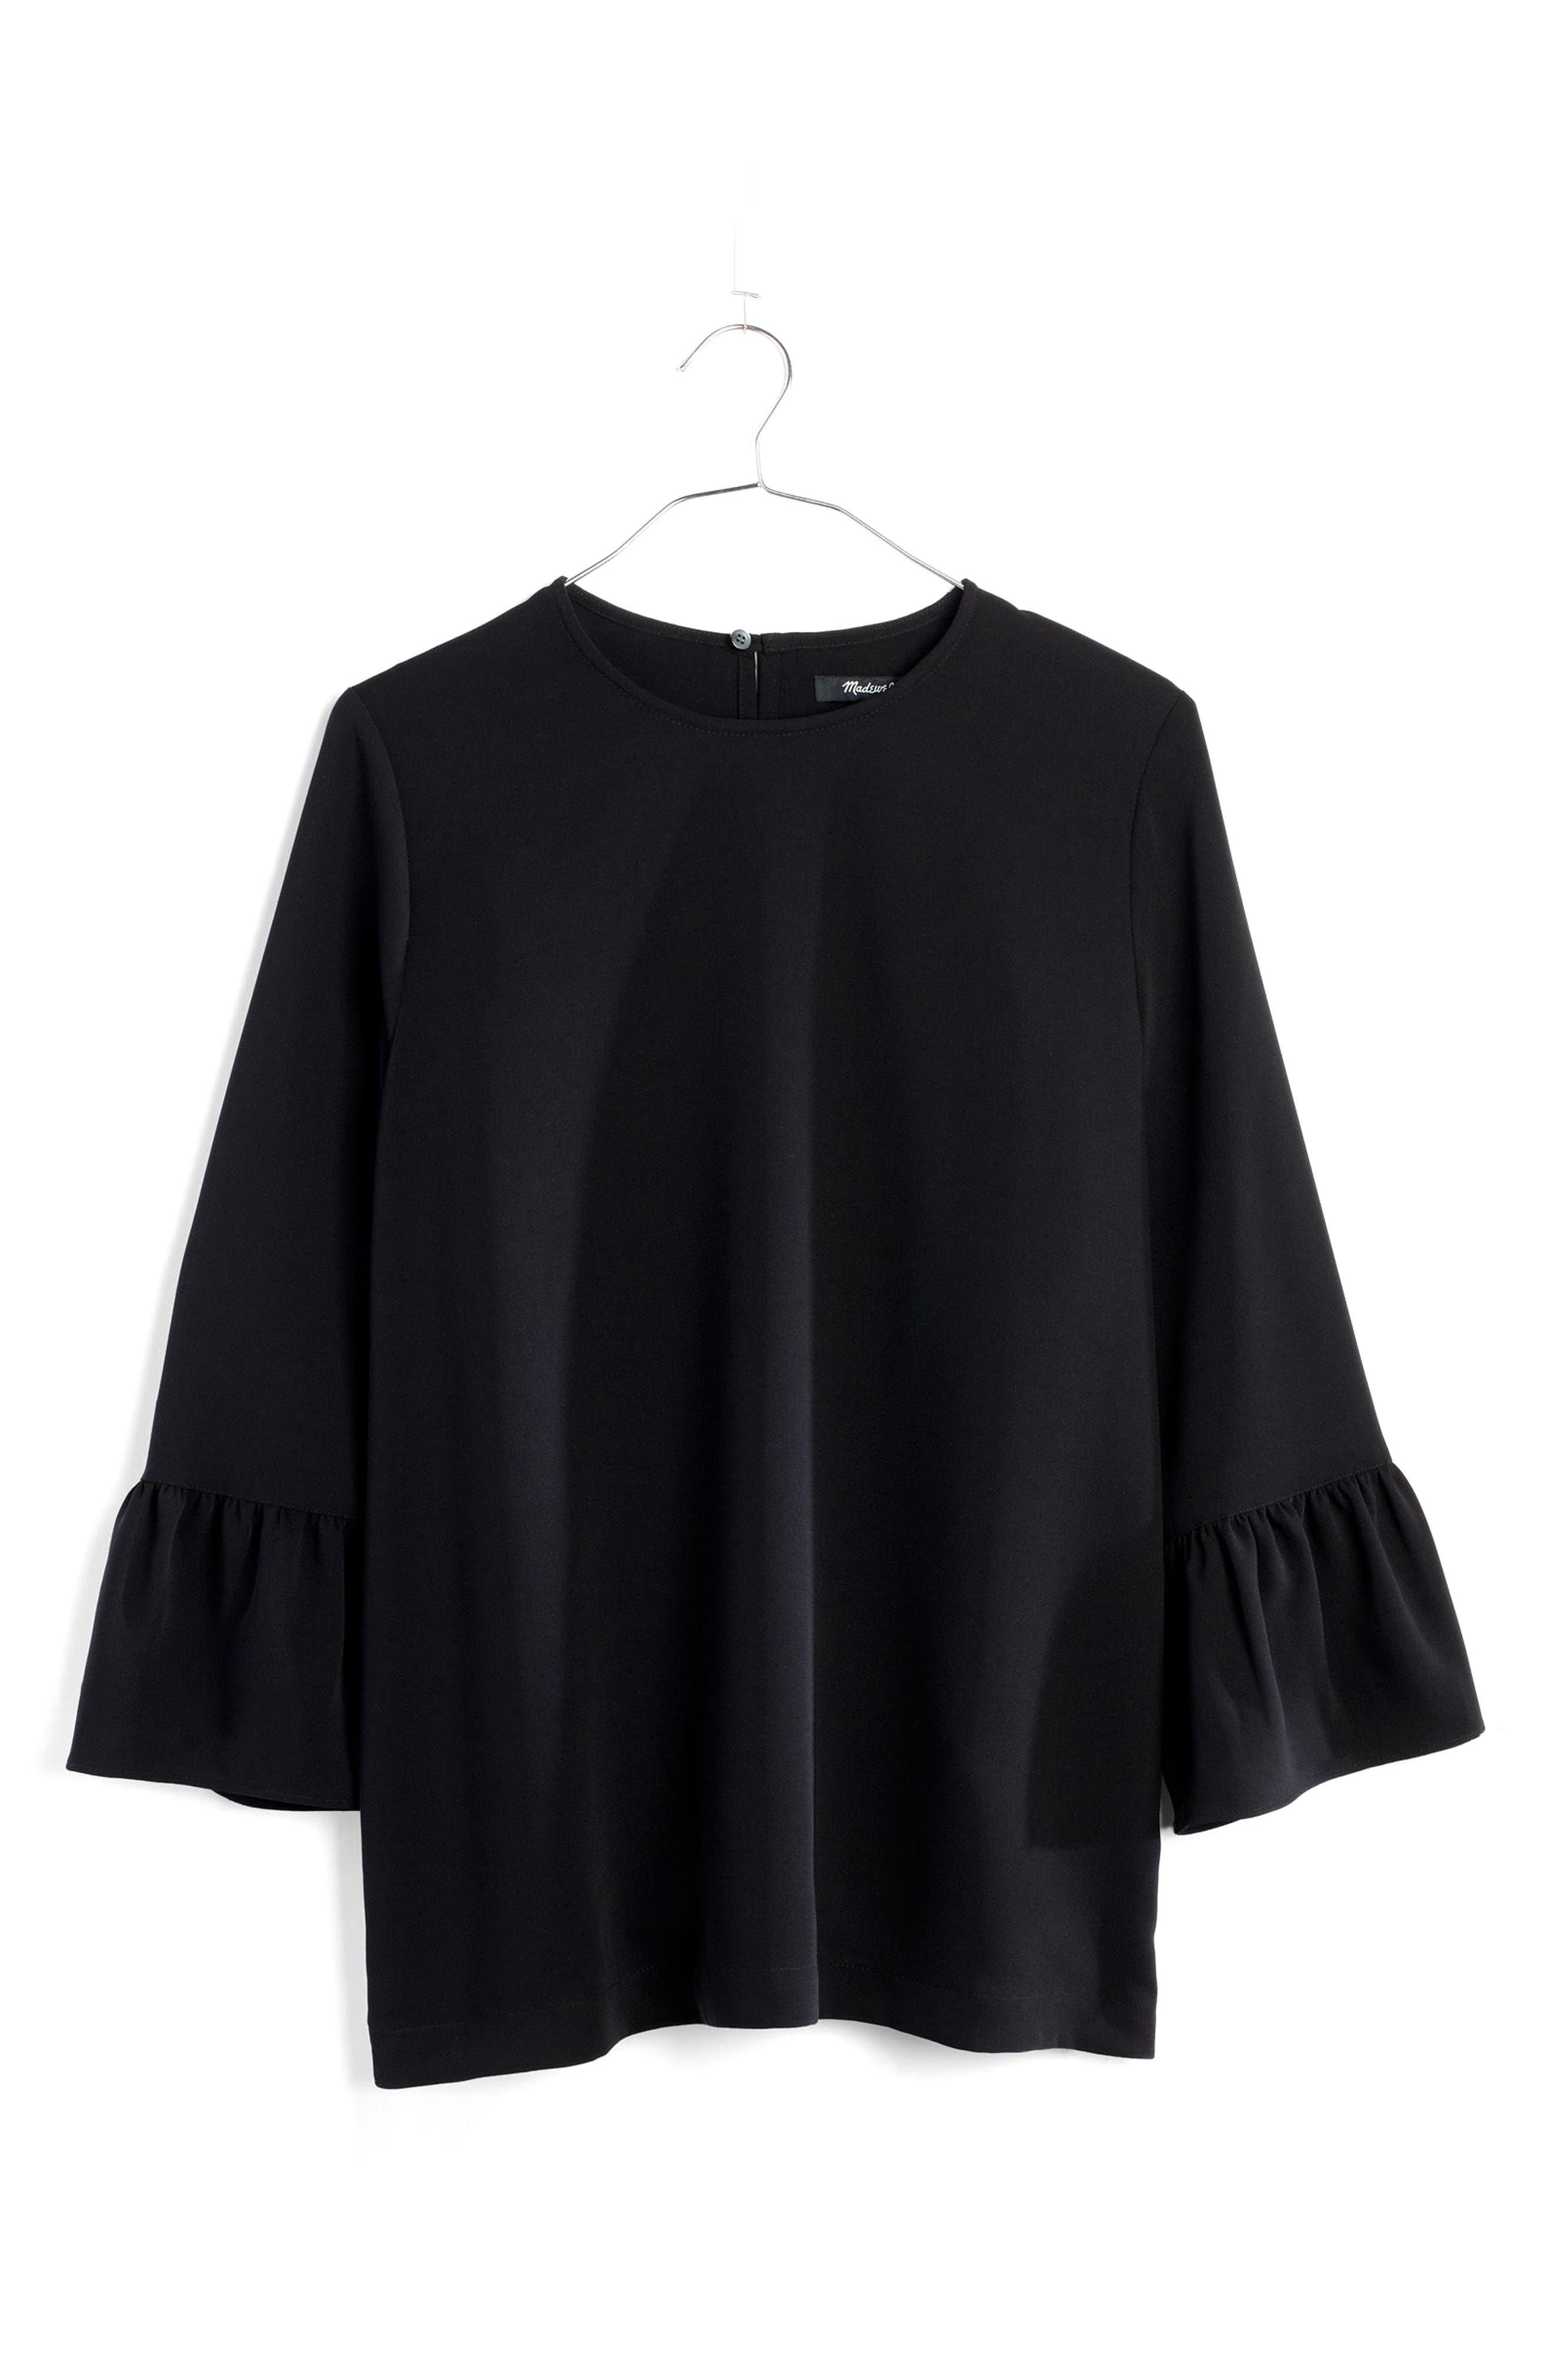 Main Image - Madewell Bell Sleeve Top